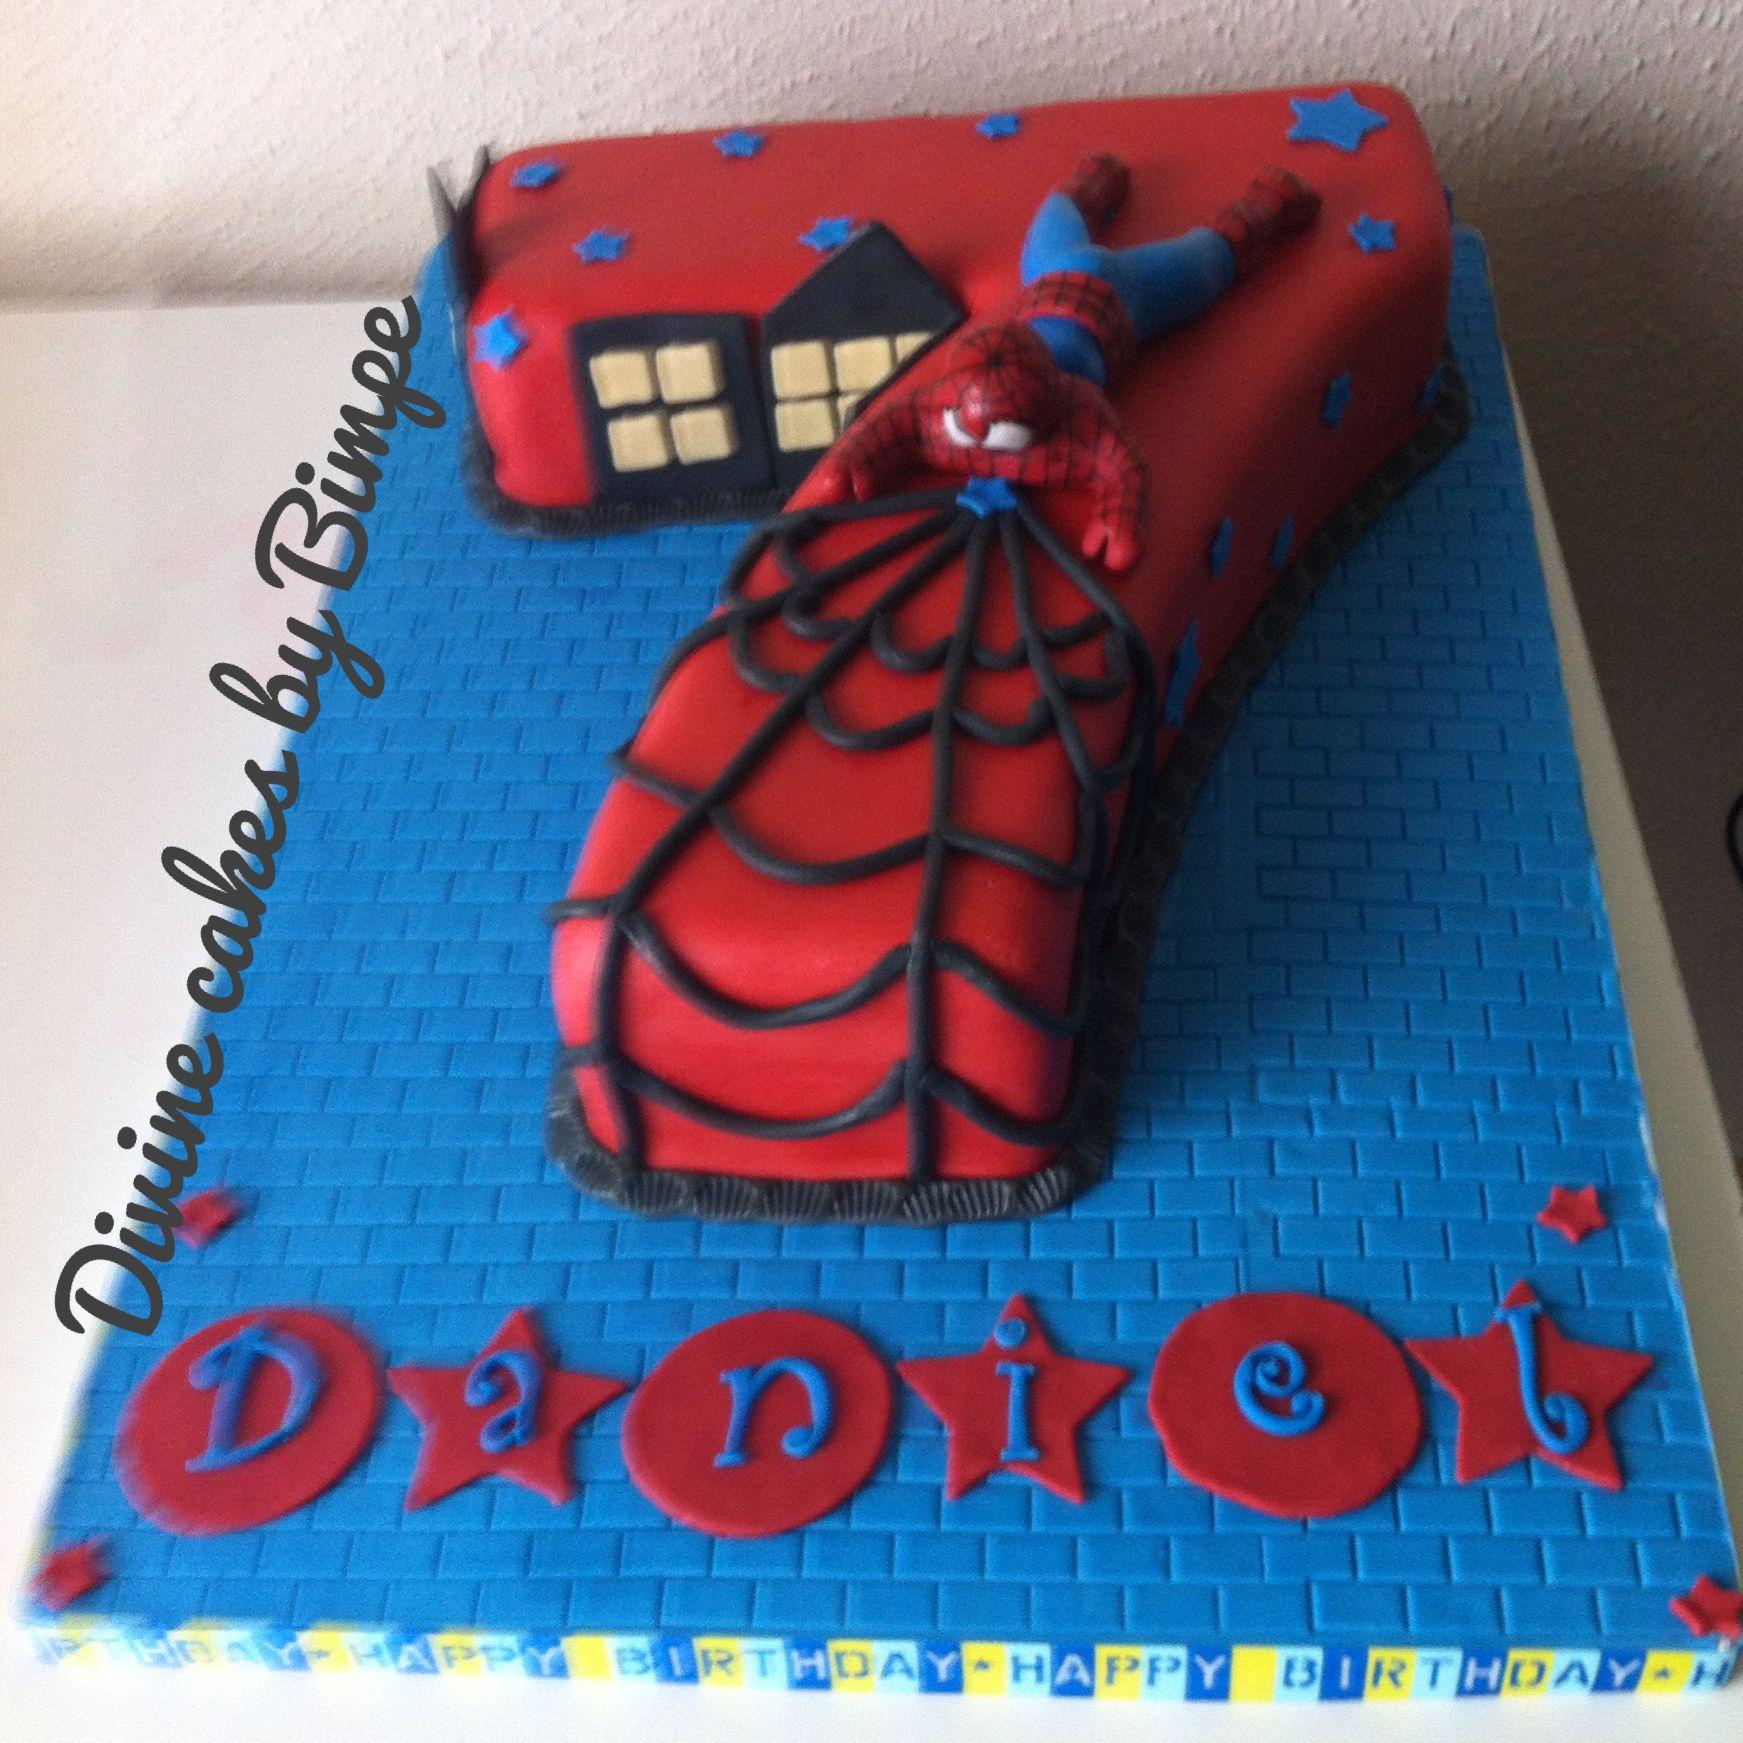 Number 7 spiderman birthday cake birthday ideas Pinterest